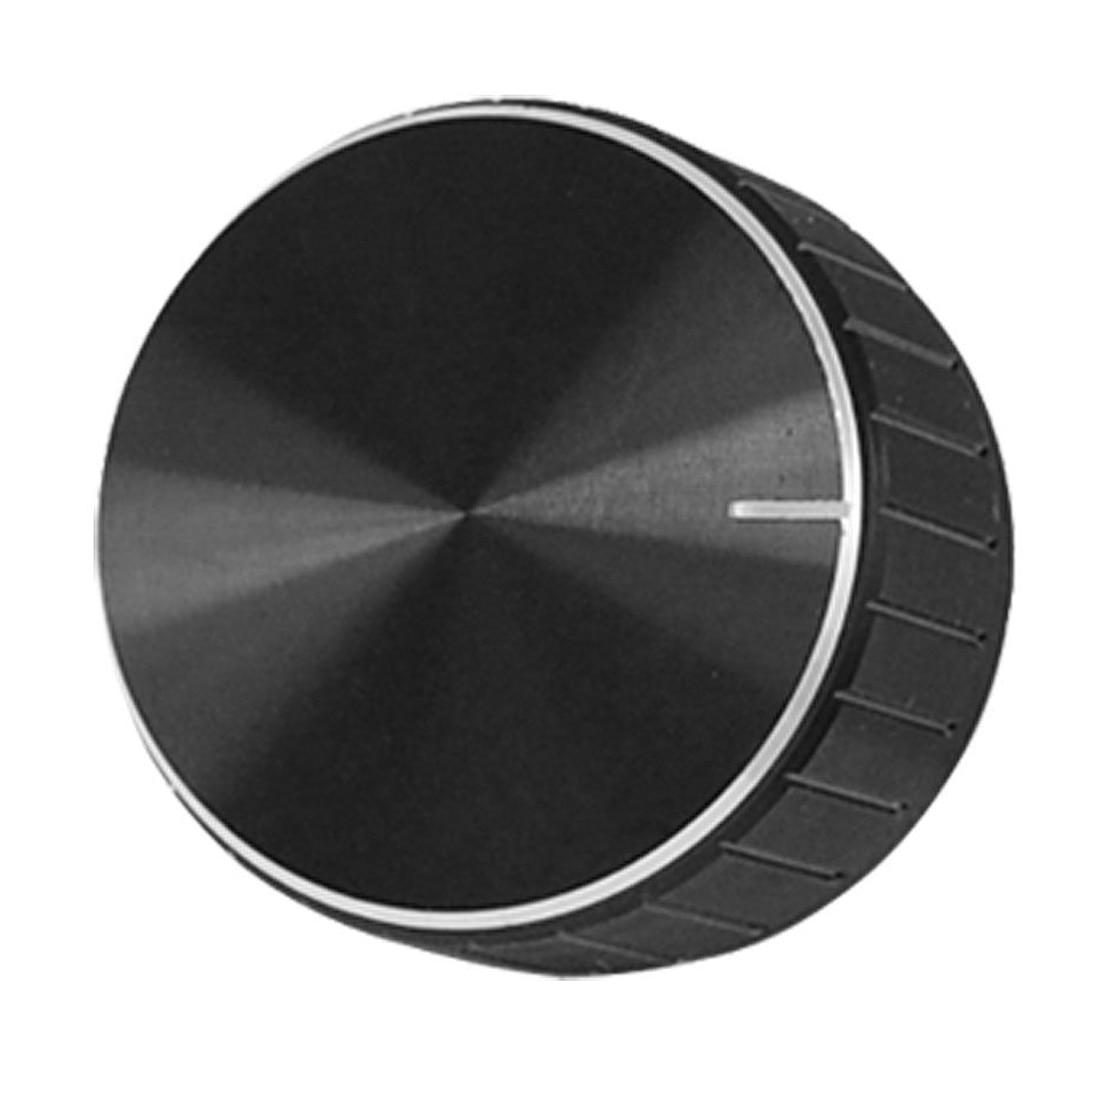 Black Aluminum Volume Control Amplifier Knob Wheel dhl ems 10 lots 43 x 20mm knob grey finish alps volume for diy amplifier upgrad g2